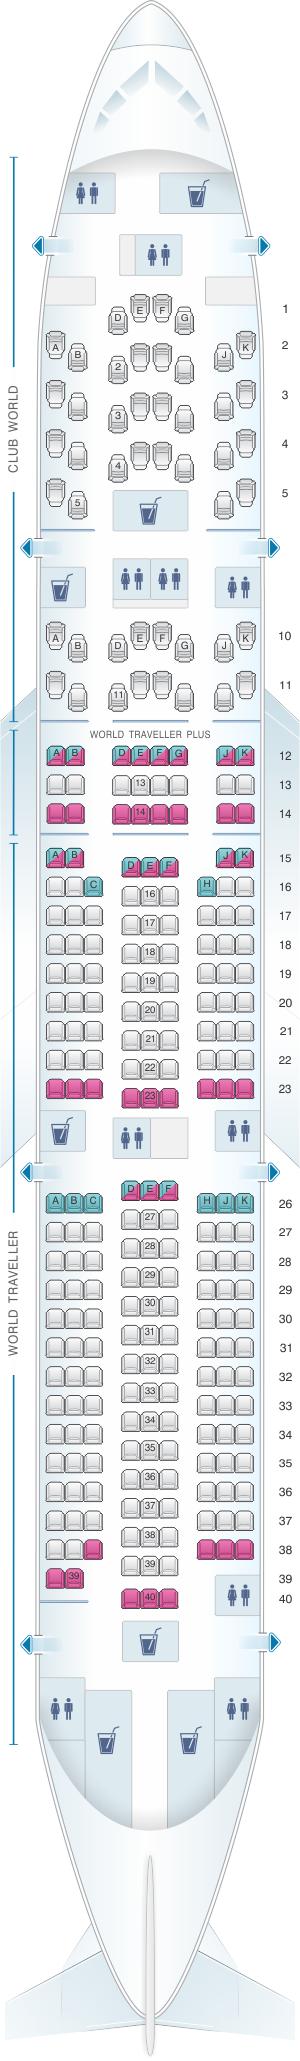 Seat map for British Airways Boeing B777 200 three class